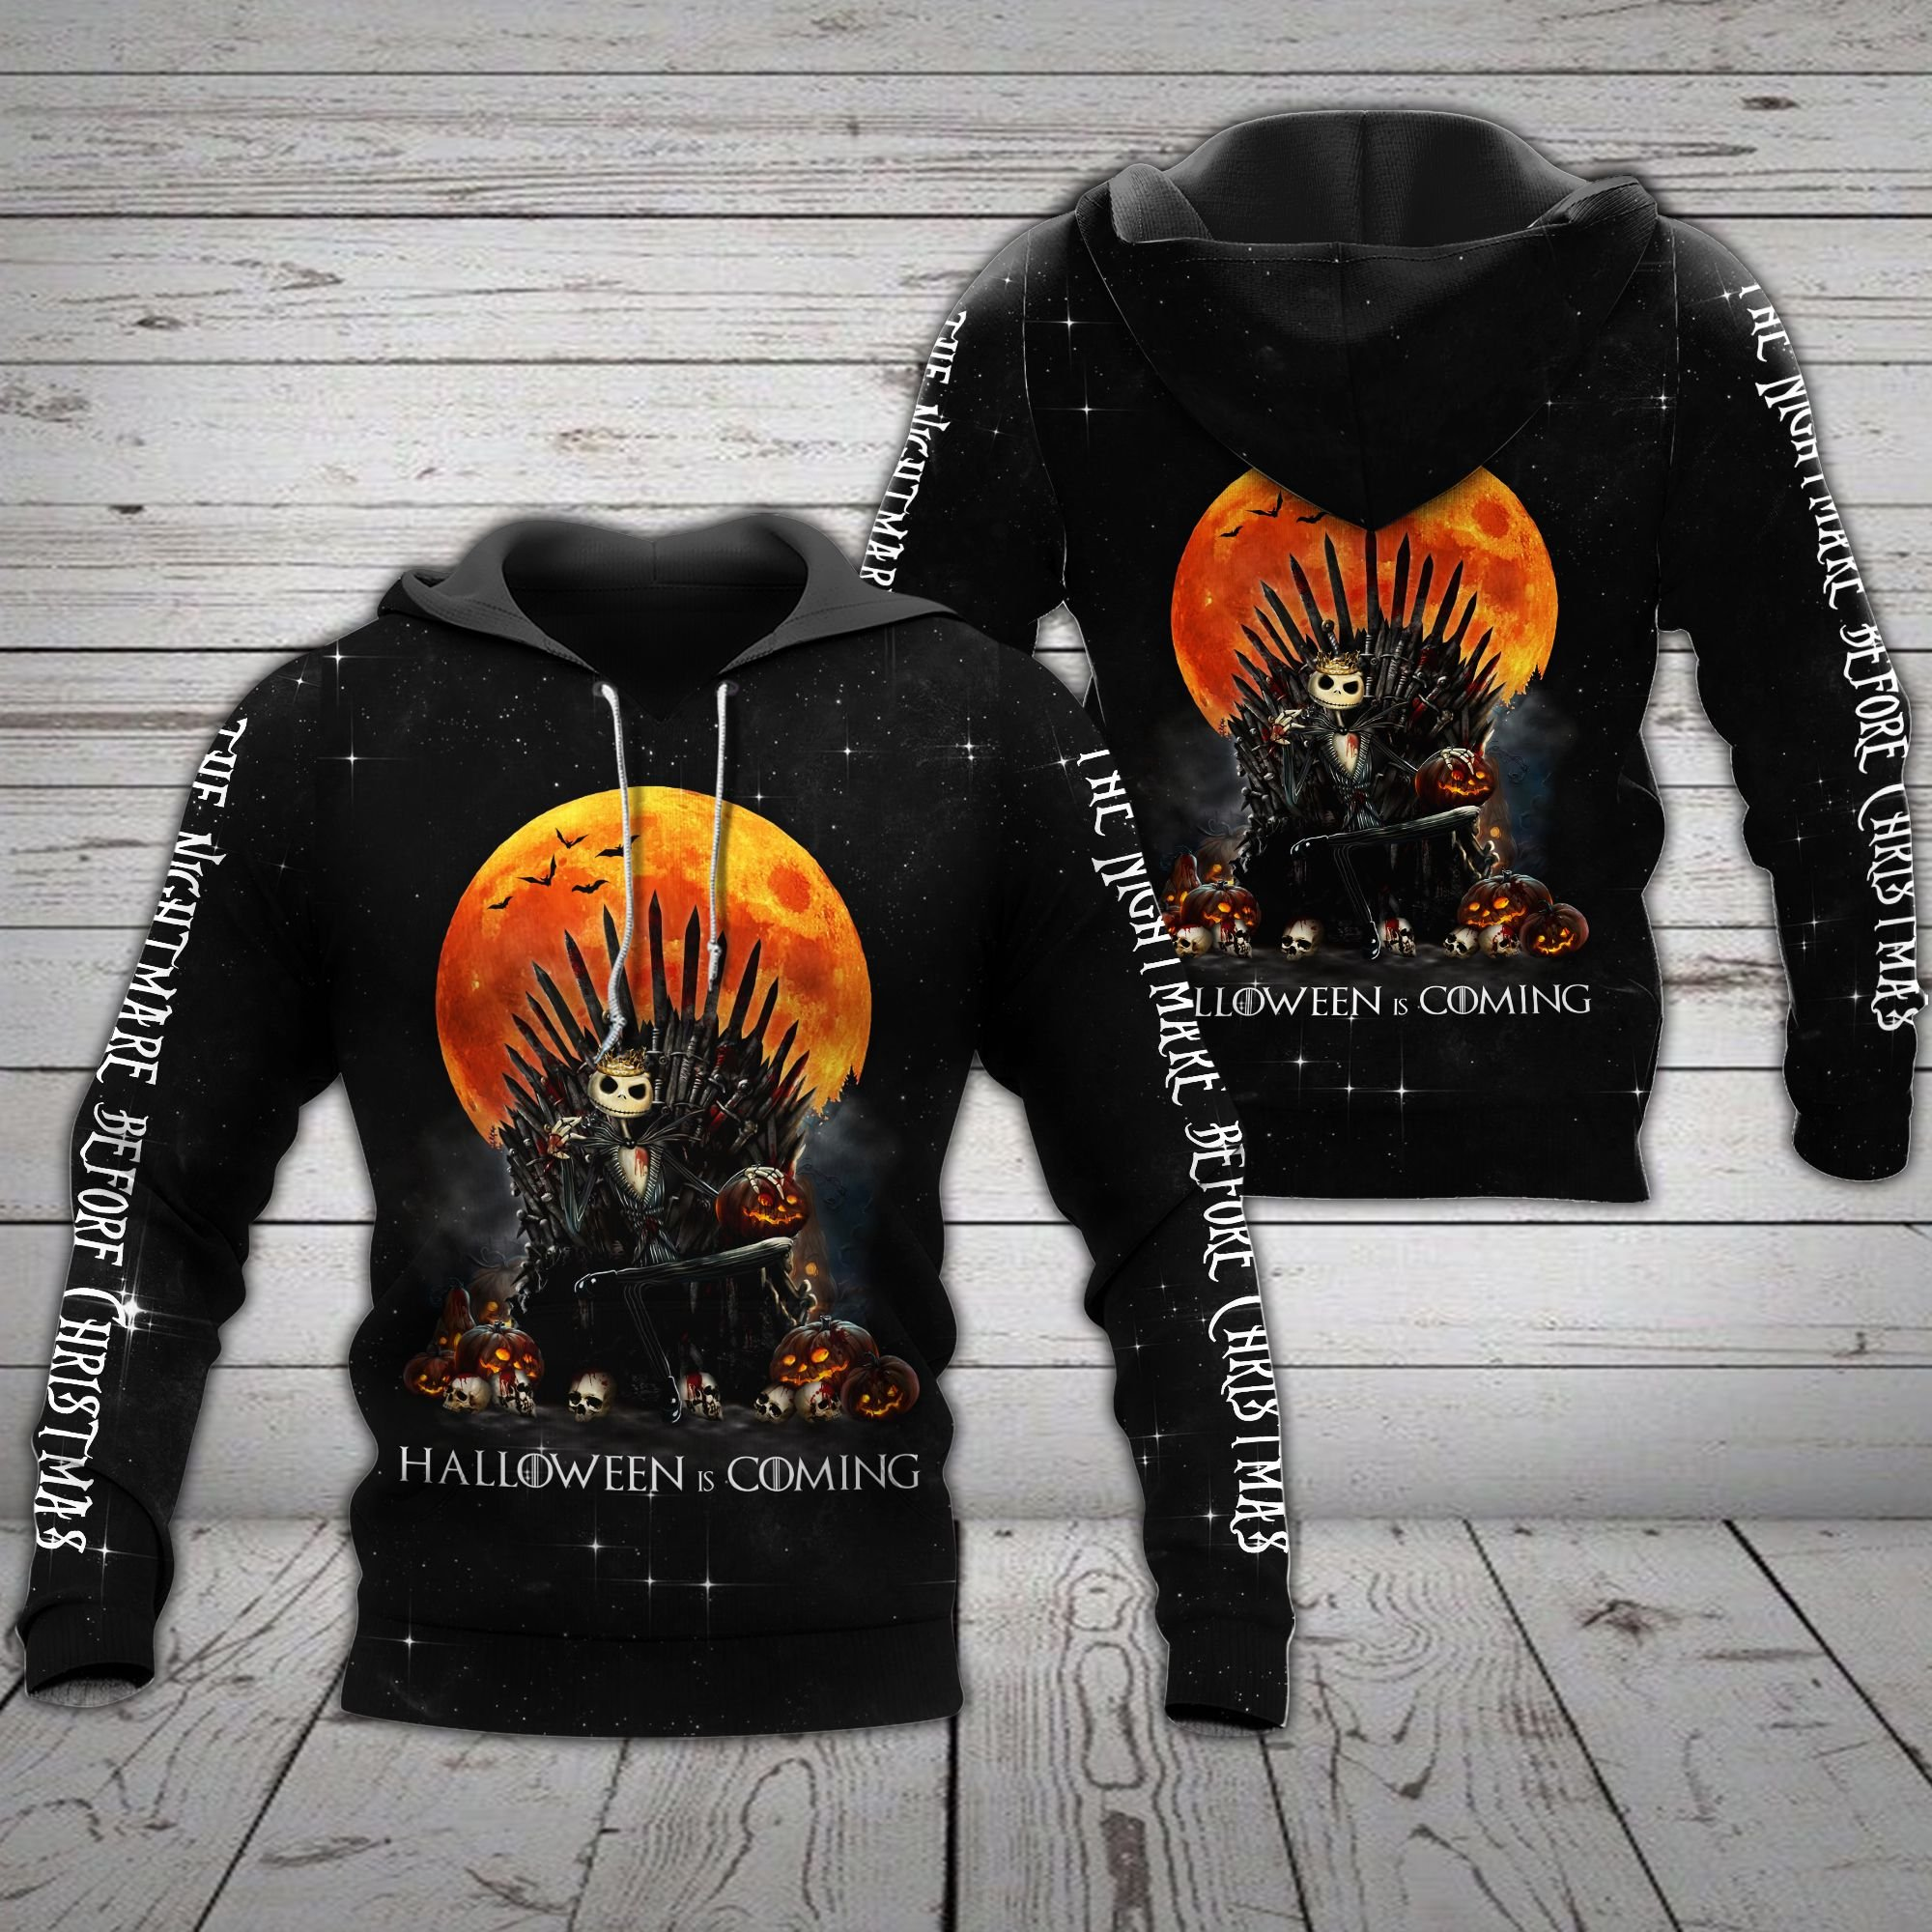 Halloween coming Skellington Iron Throne 3D hoodie